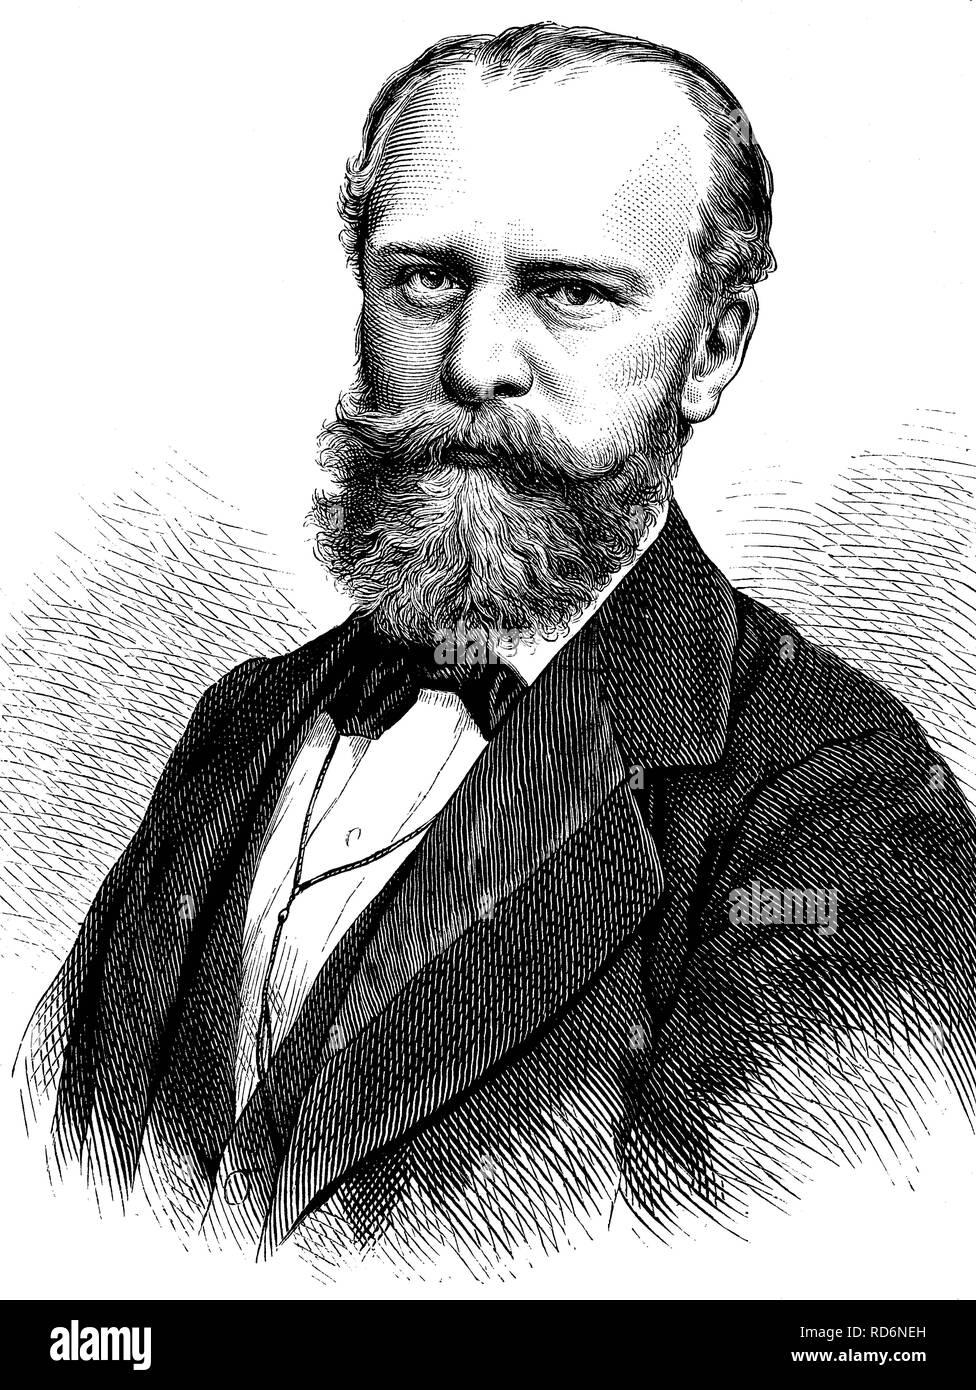 Julius Wolff, 1834-1910, German poet and writer, historical illustration, circa 1886 - Stock Image